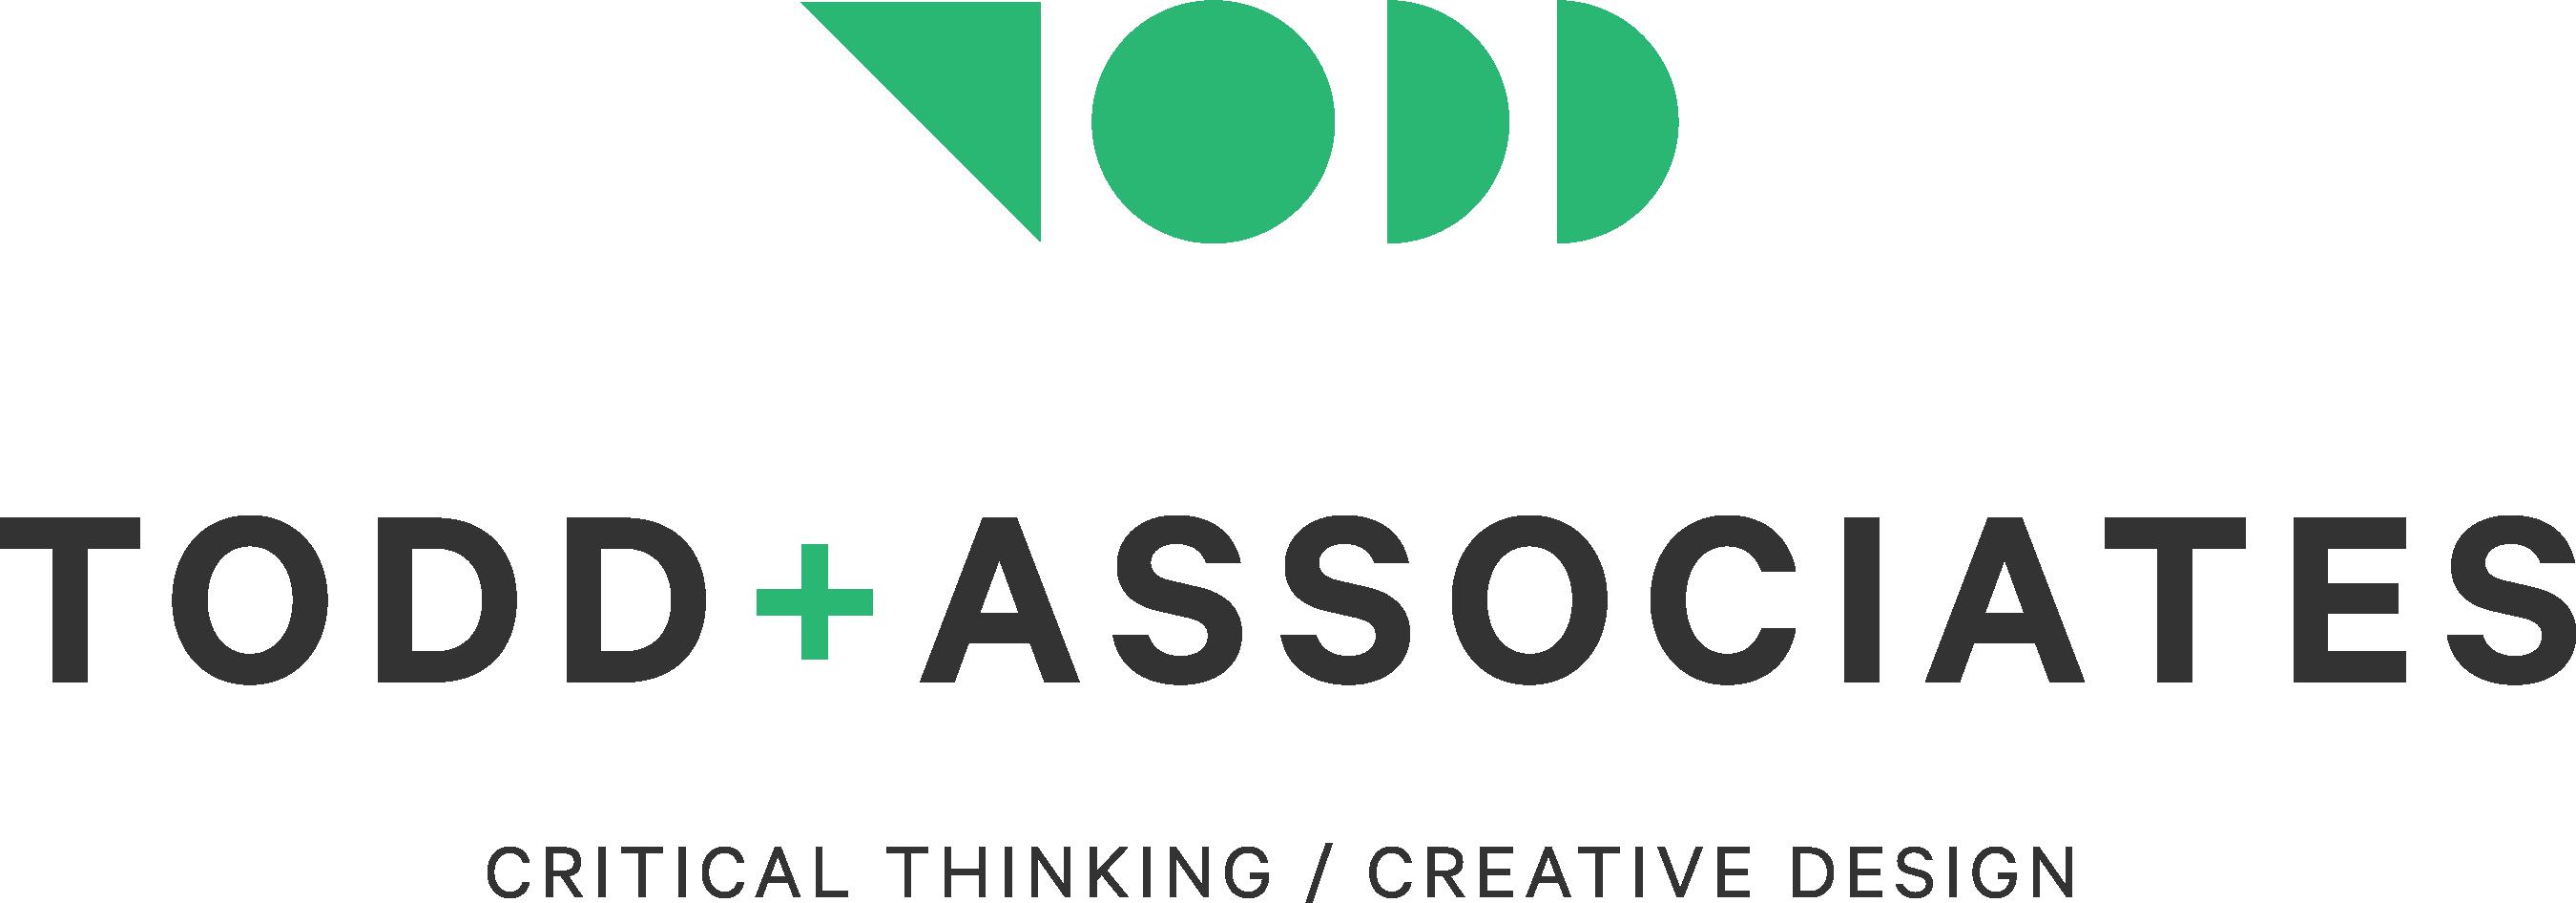 Todd & Associates